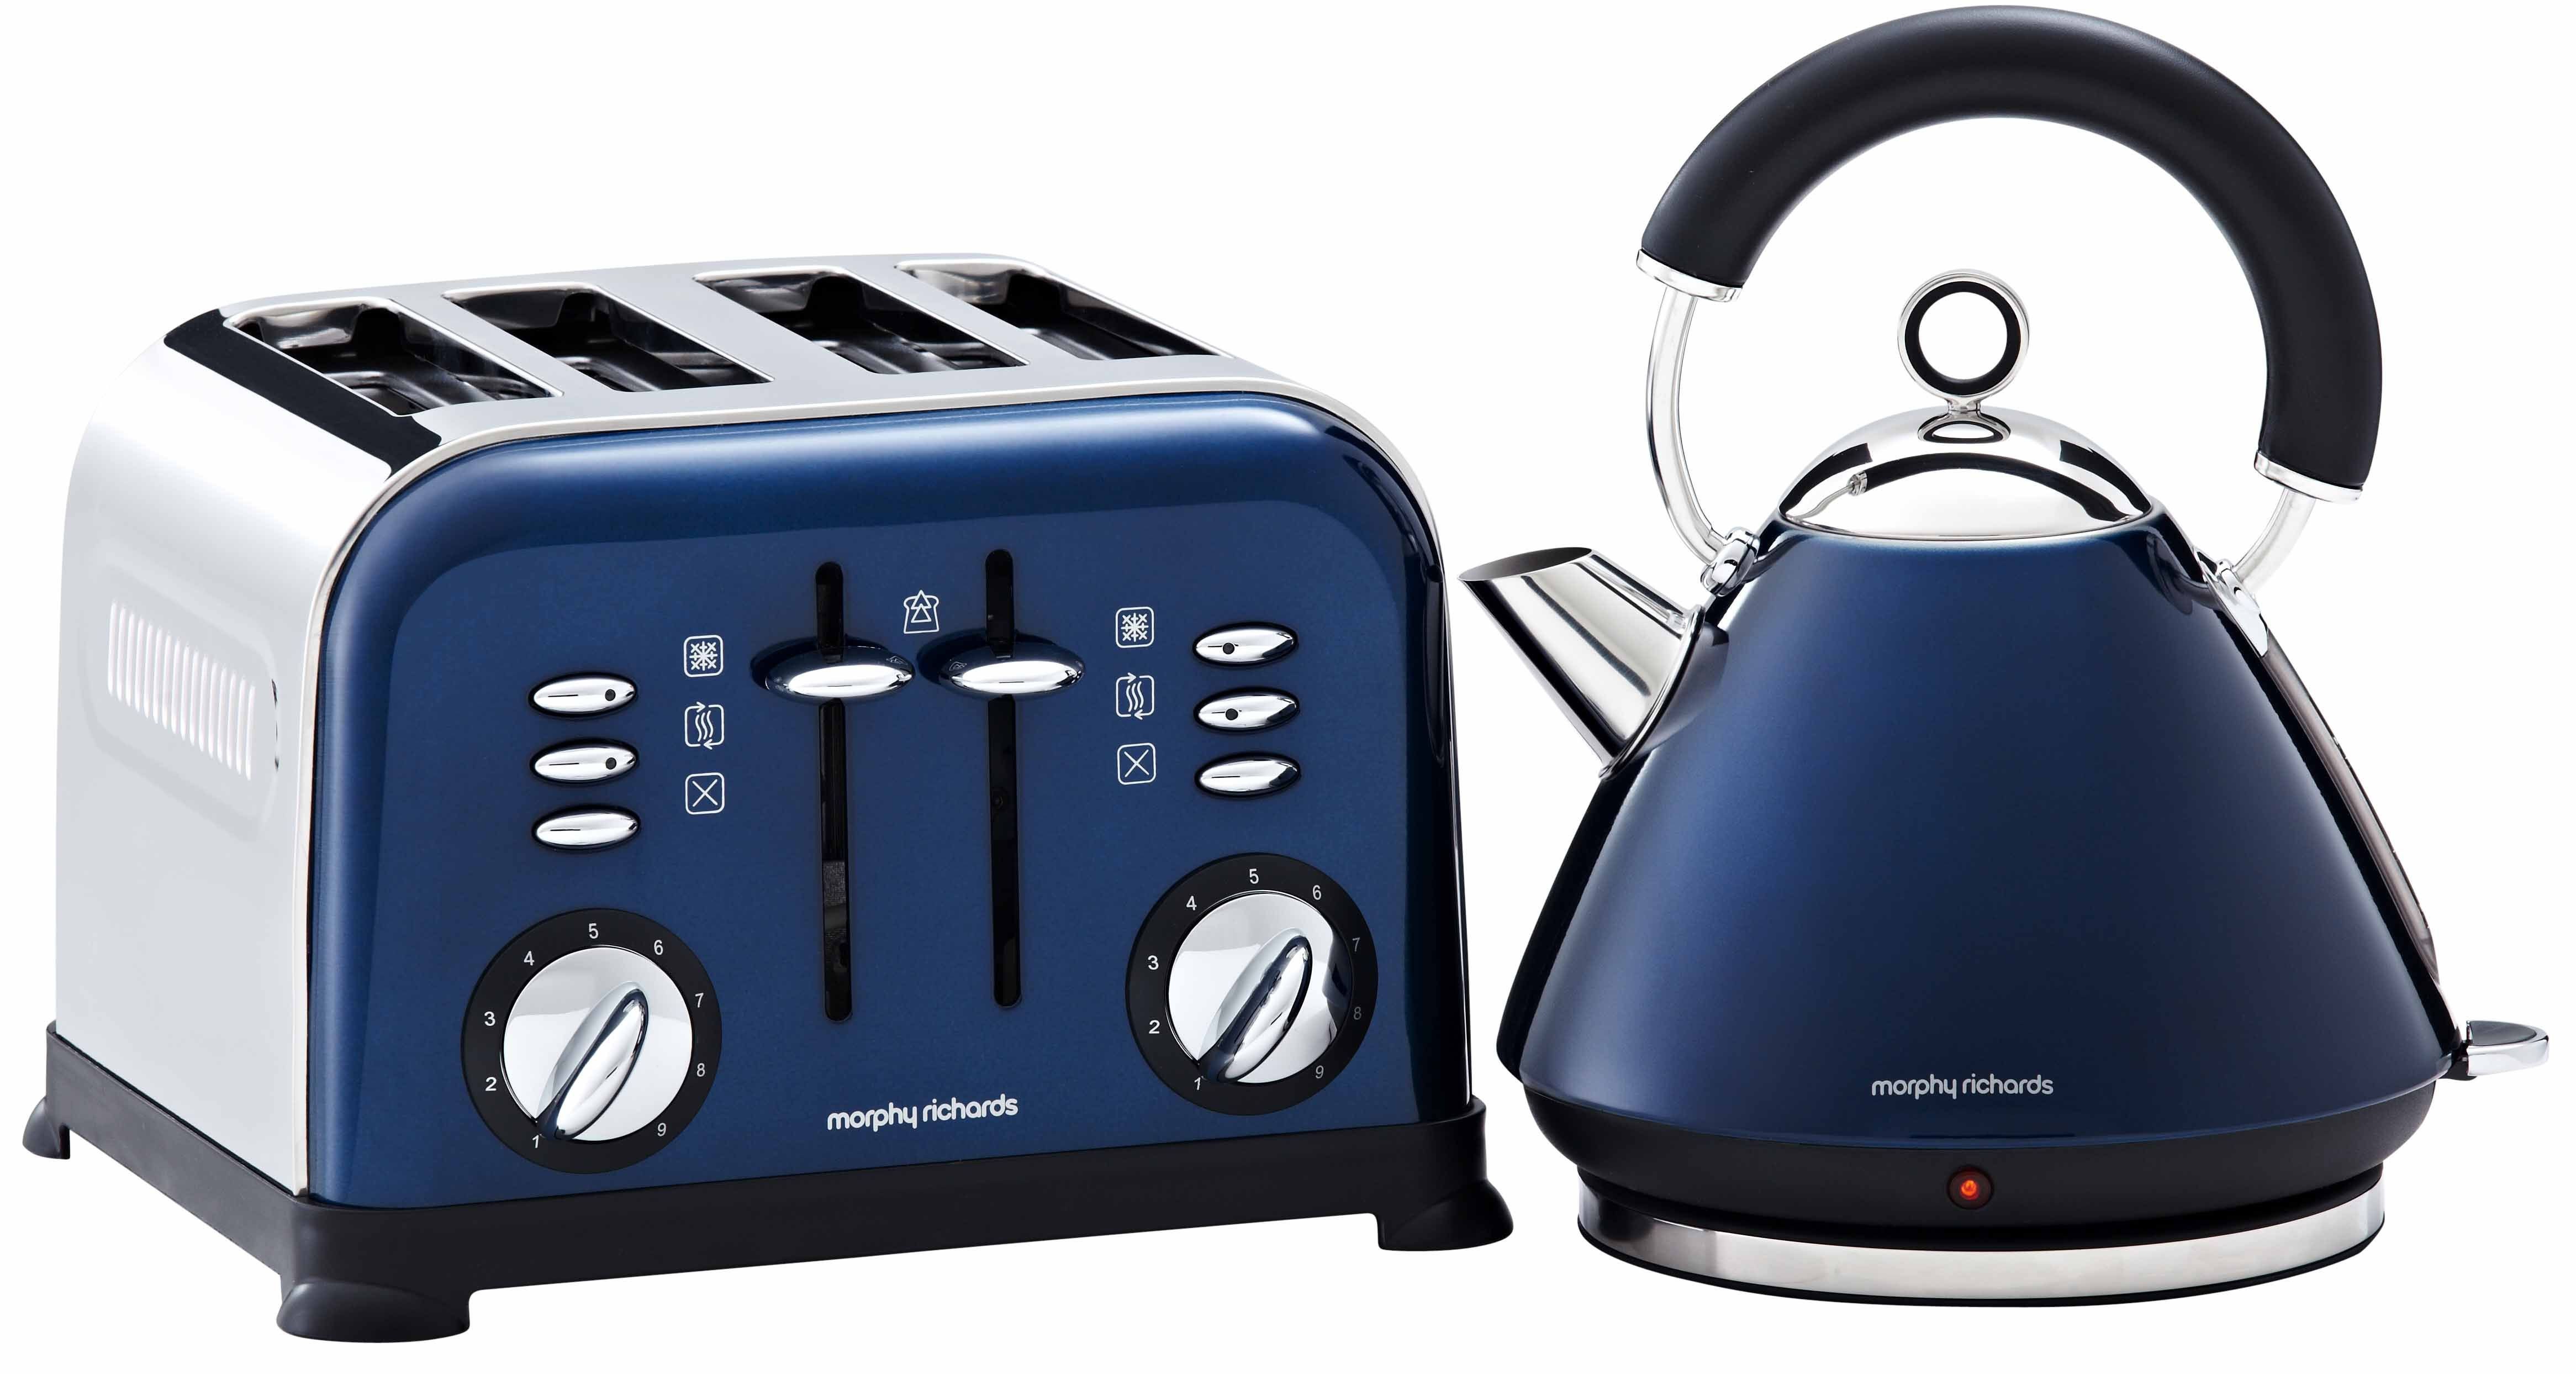 The latest colourful kitchen appliances  my kitchen